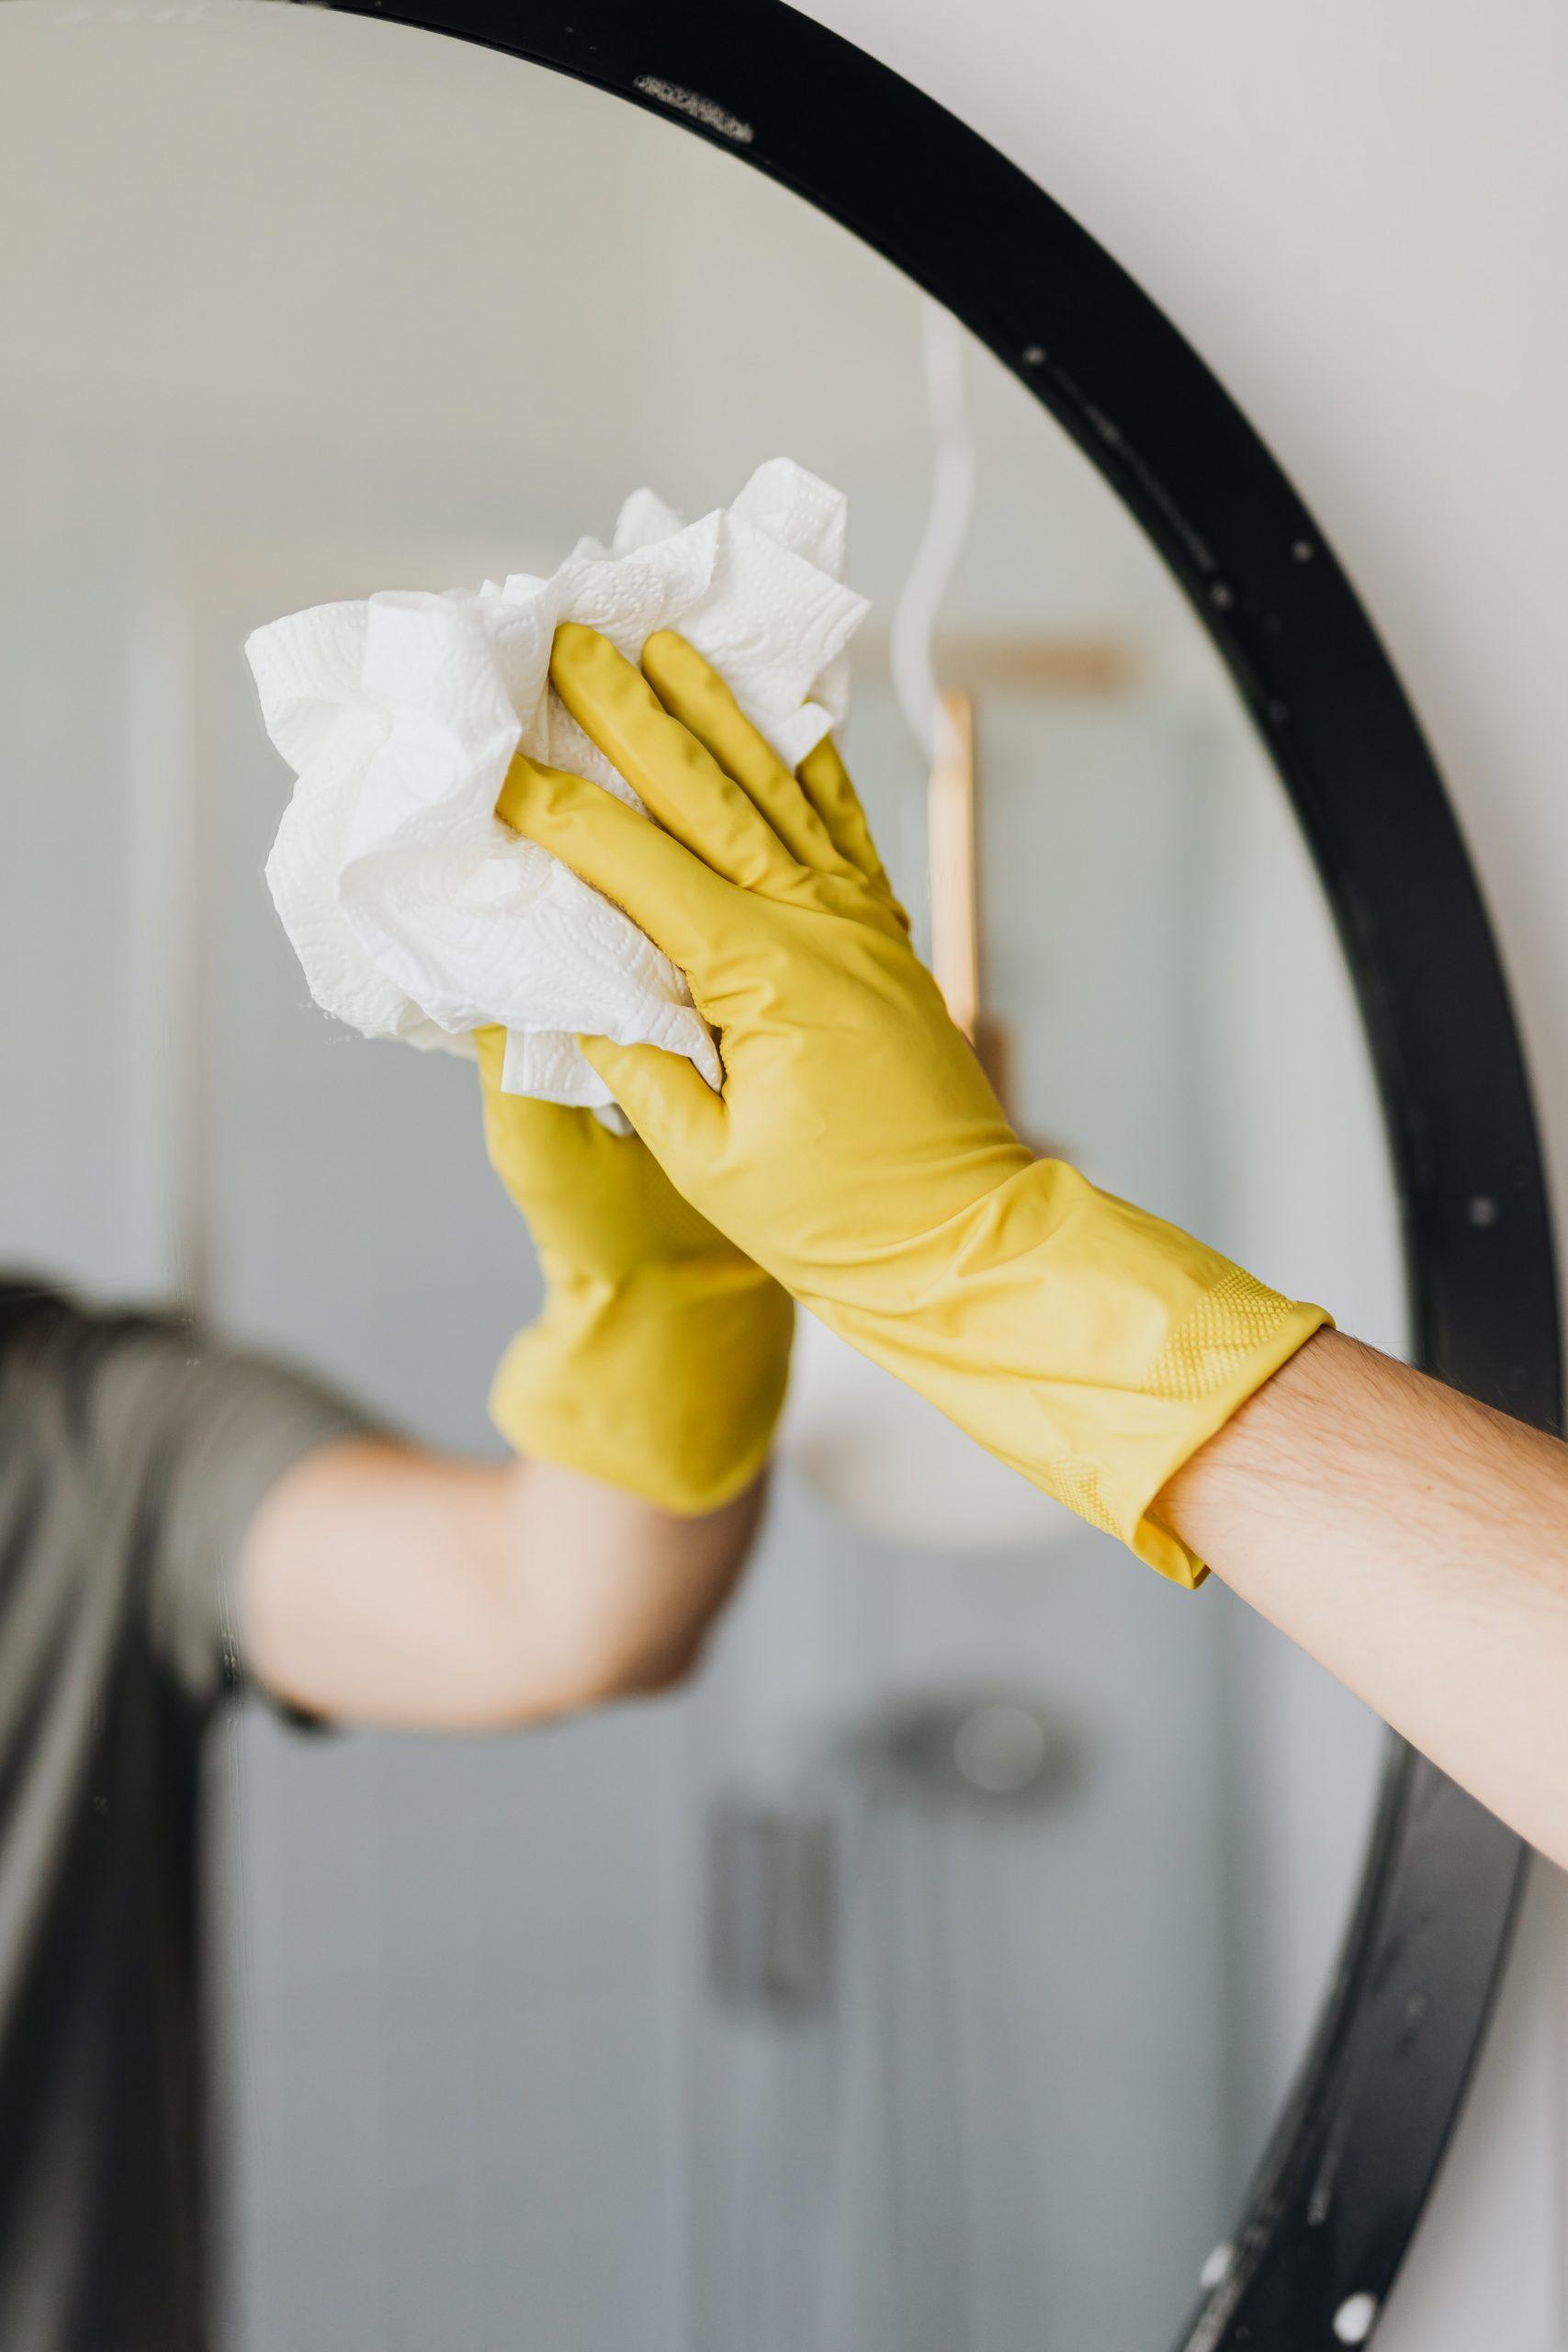 Unique cleaning